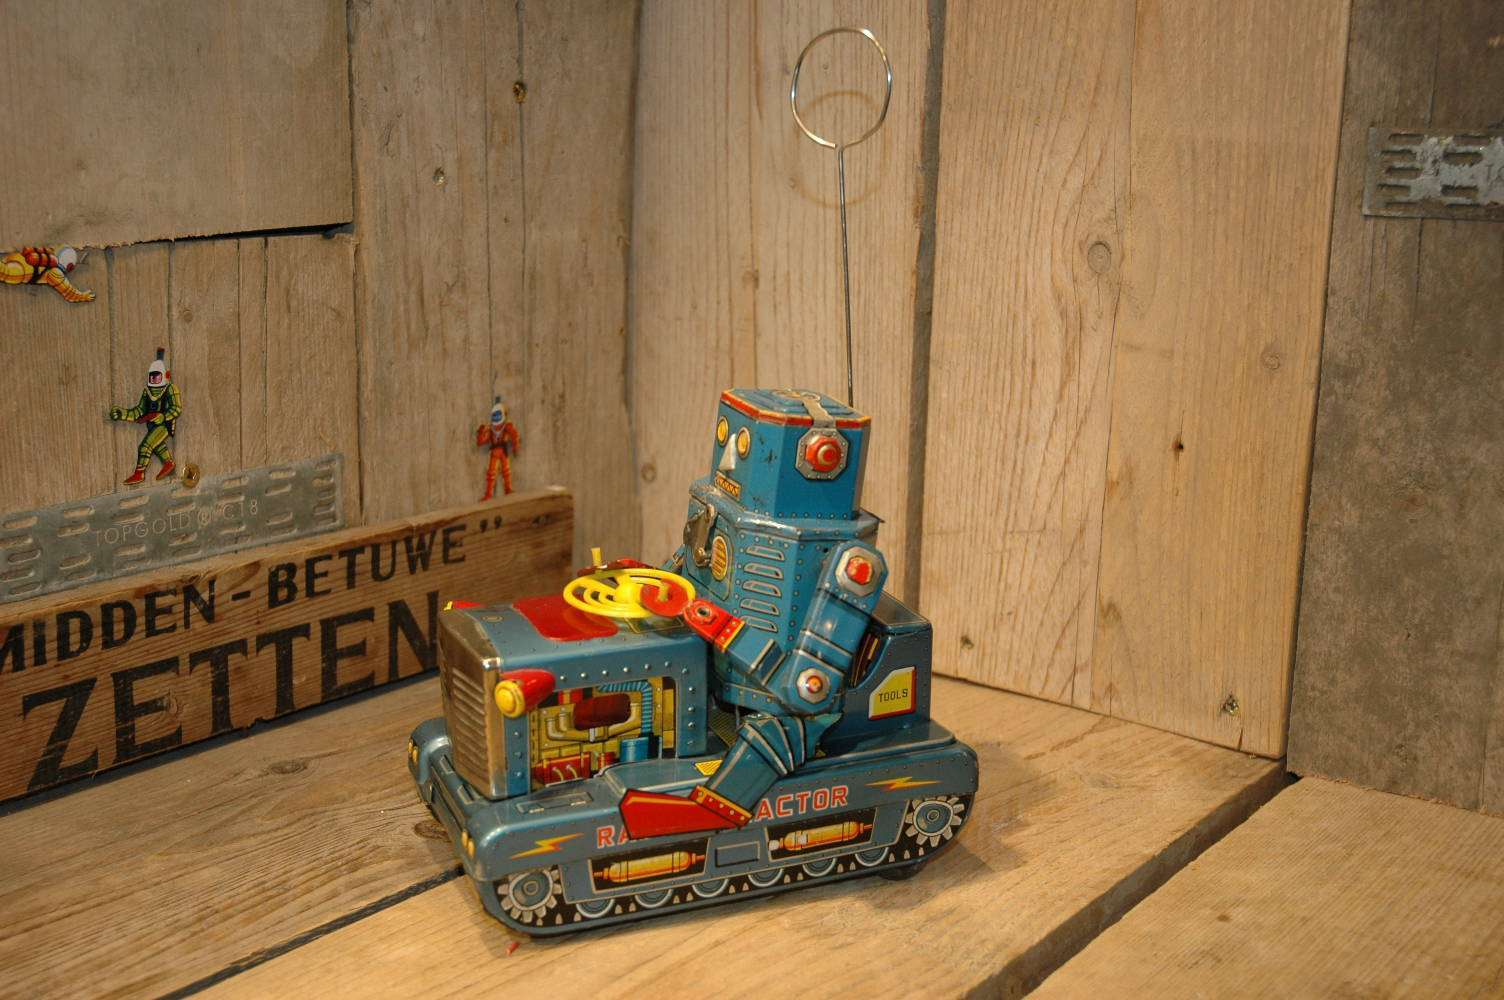 VST - Robot Radar Tractor X-9